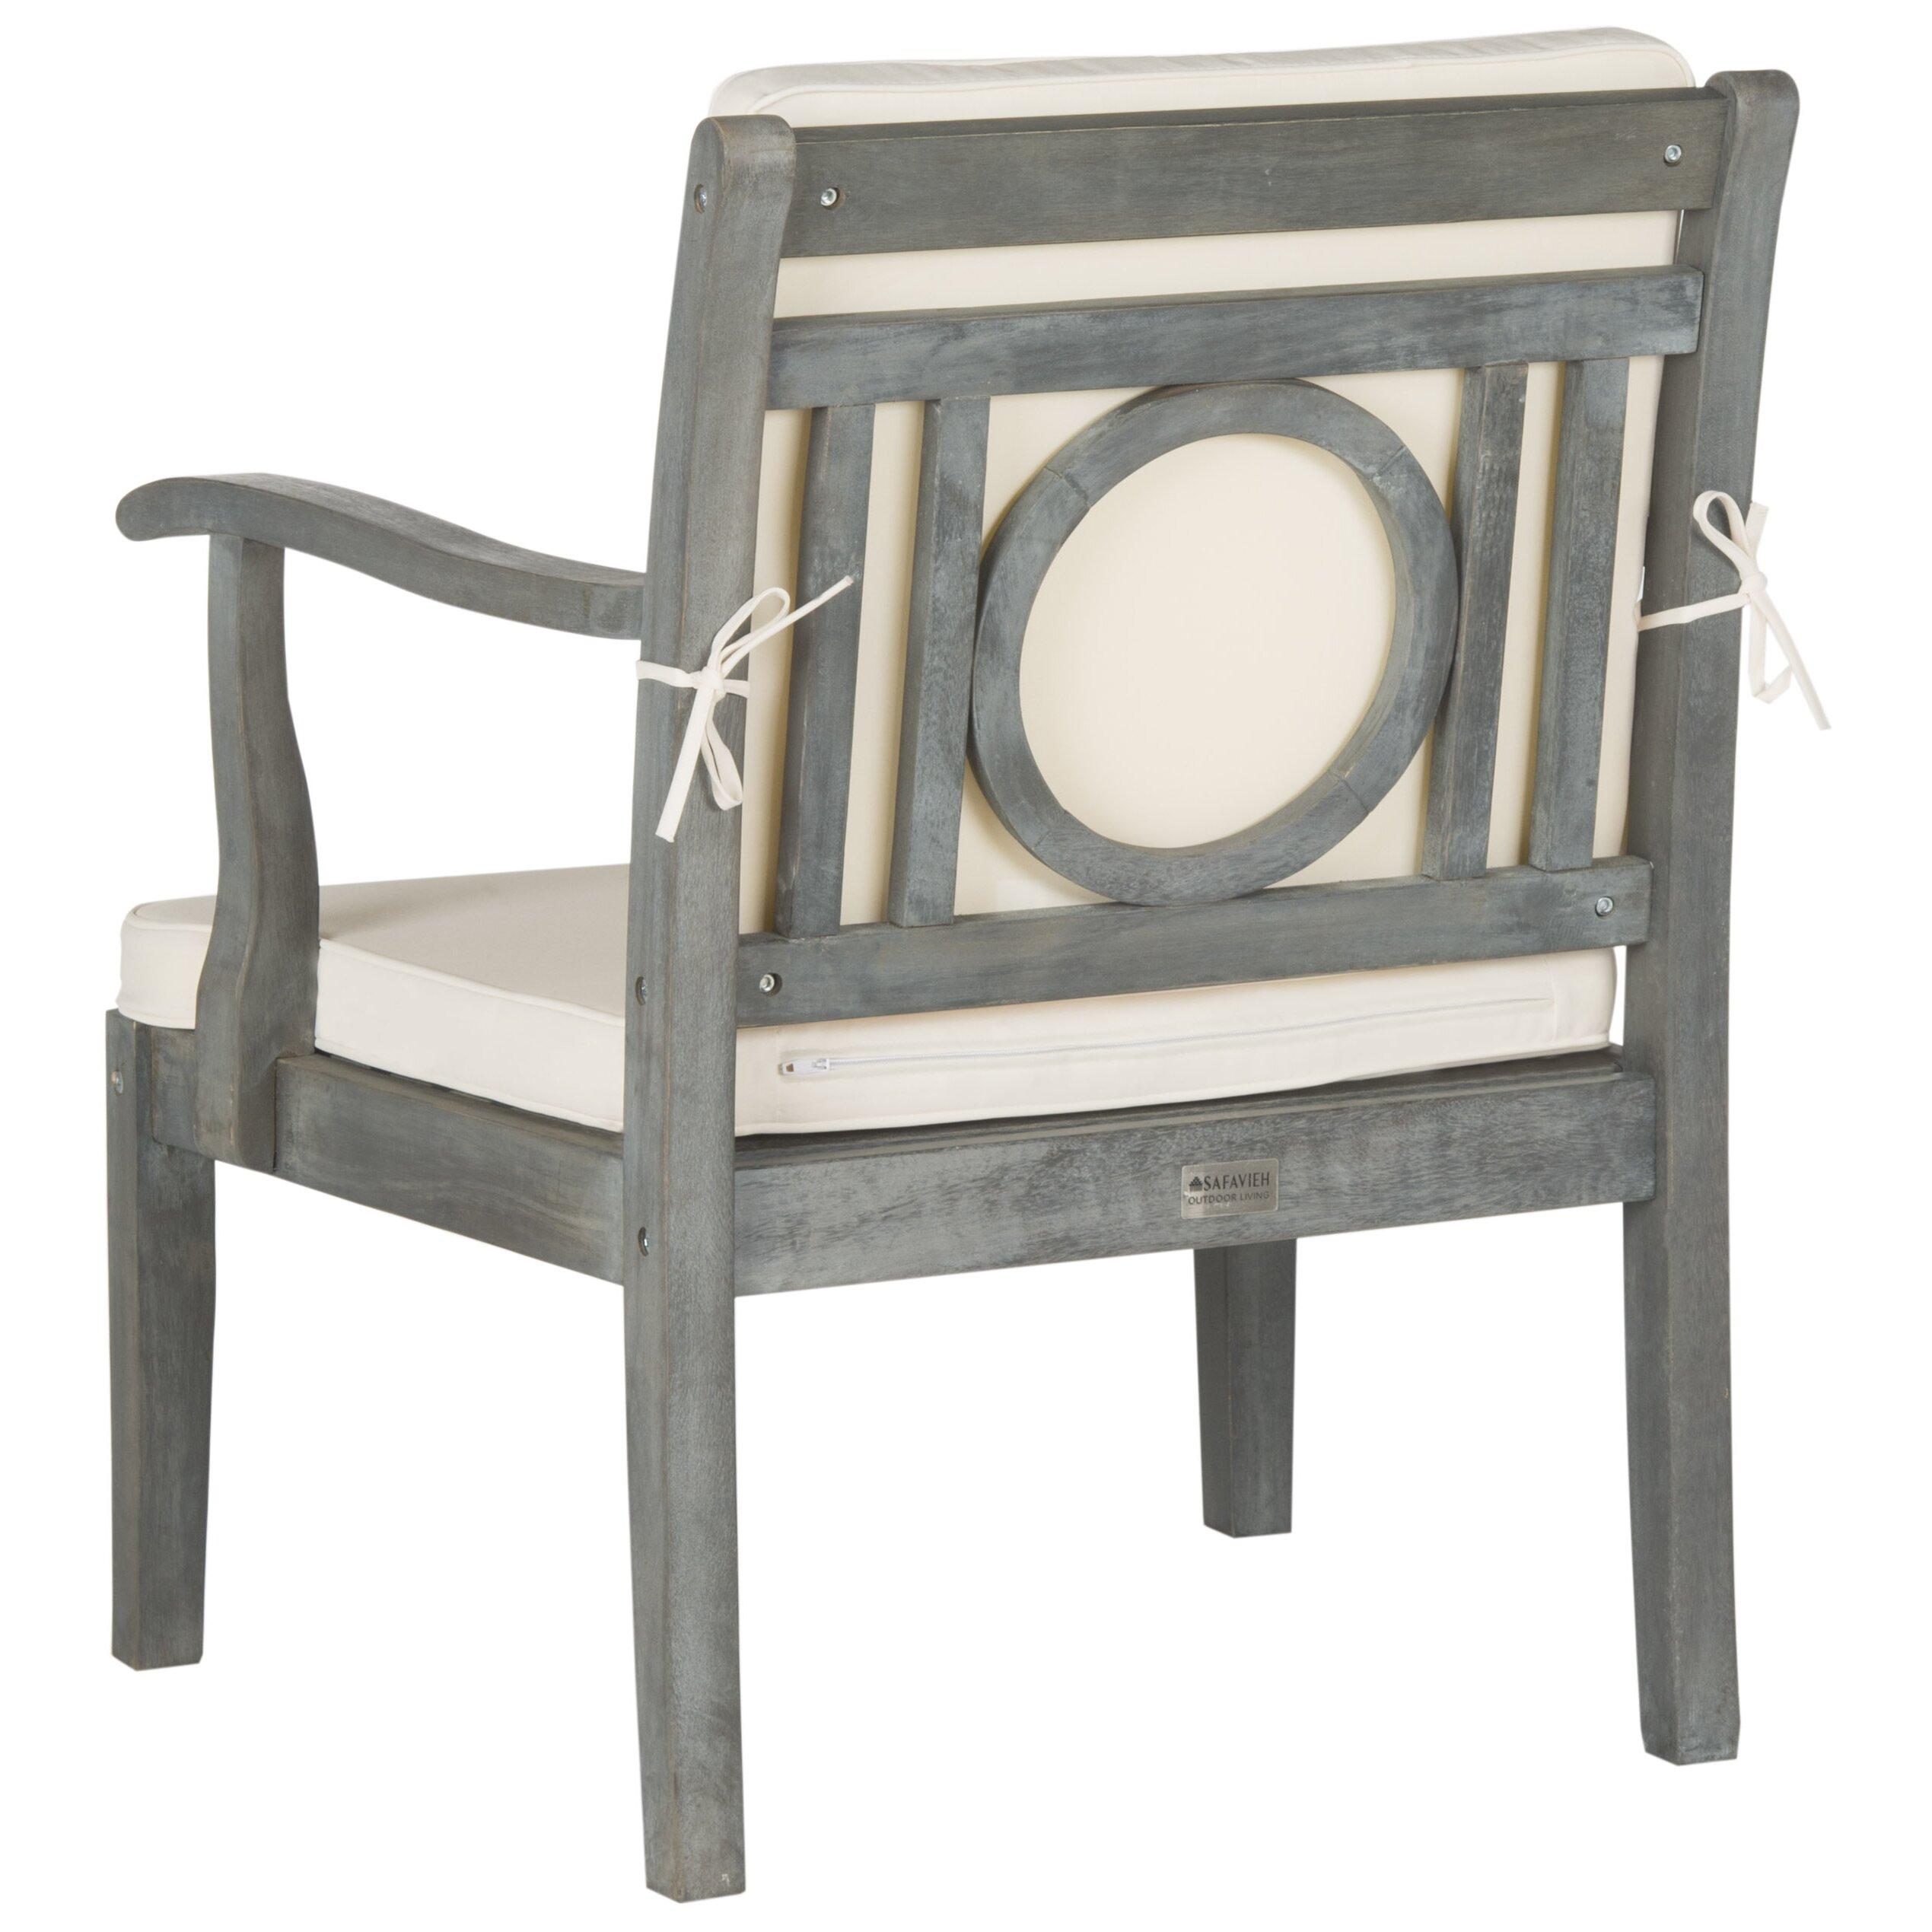 Montclair Outdoor Patio Furniture Simplylushliving